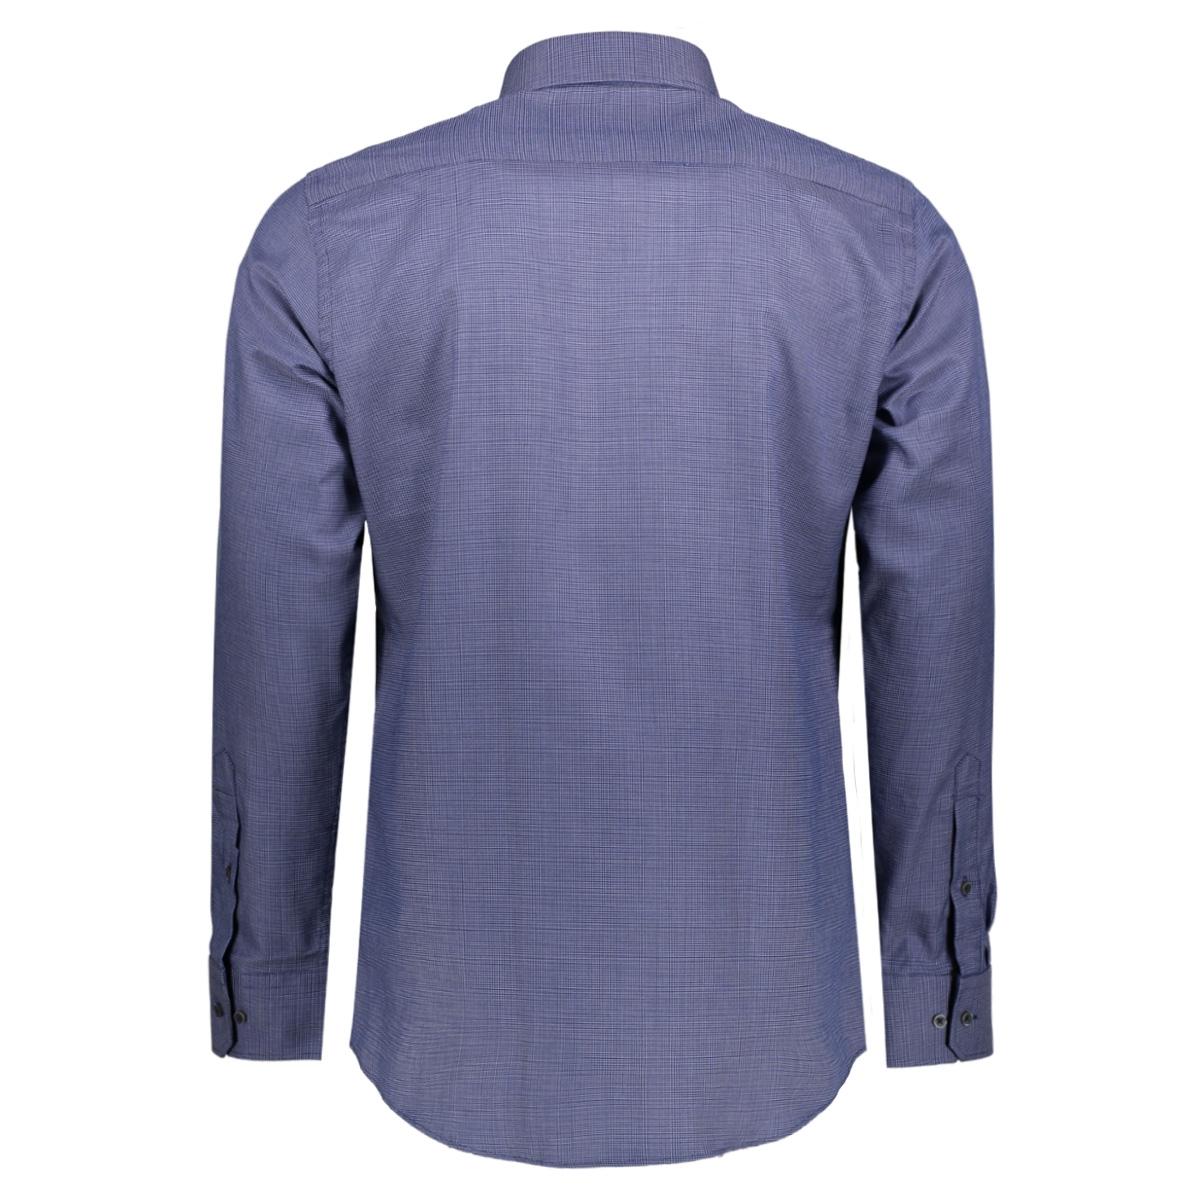 pmoh300034 michaelis overhemd navy